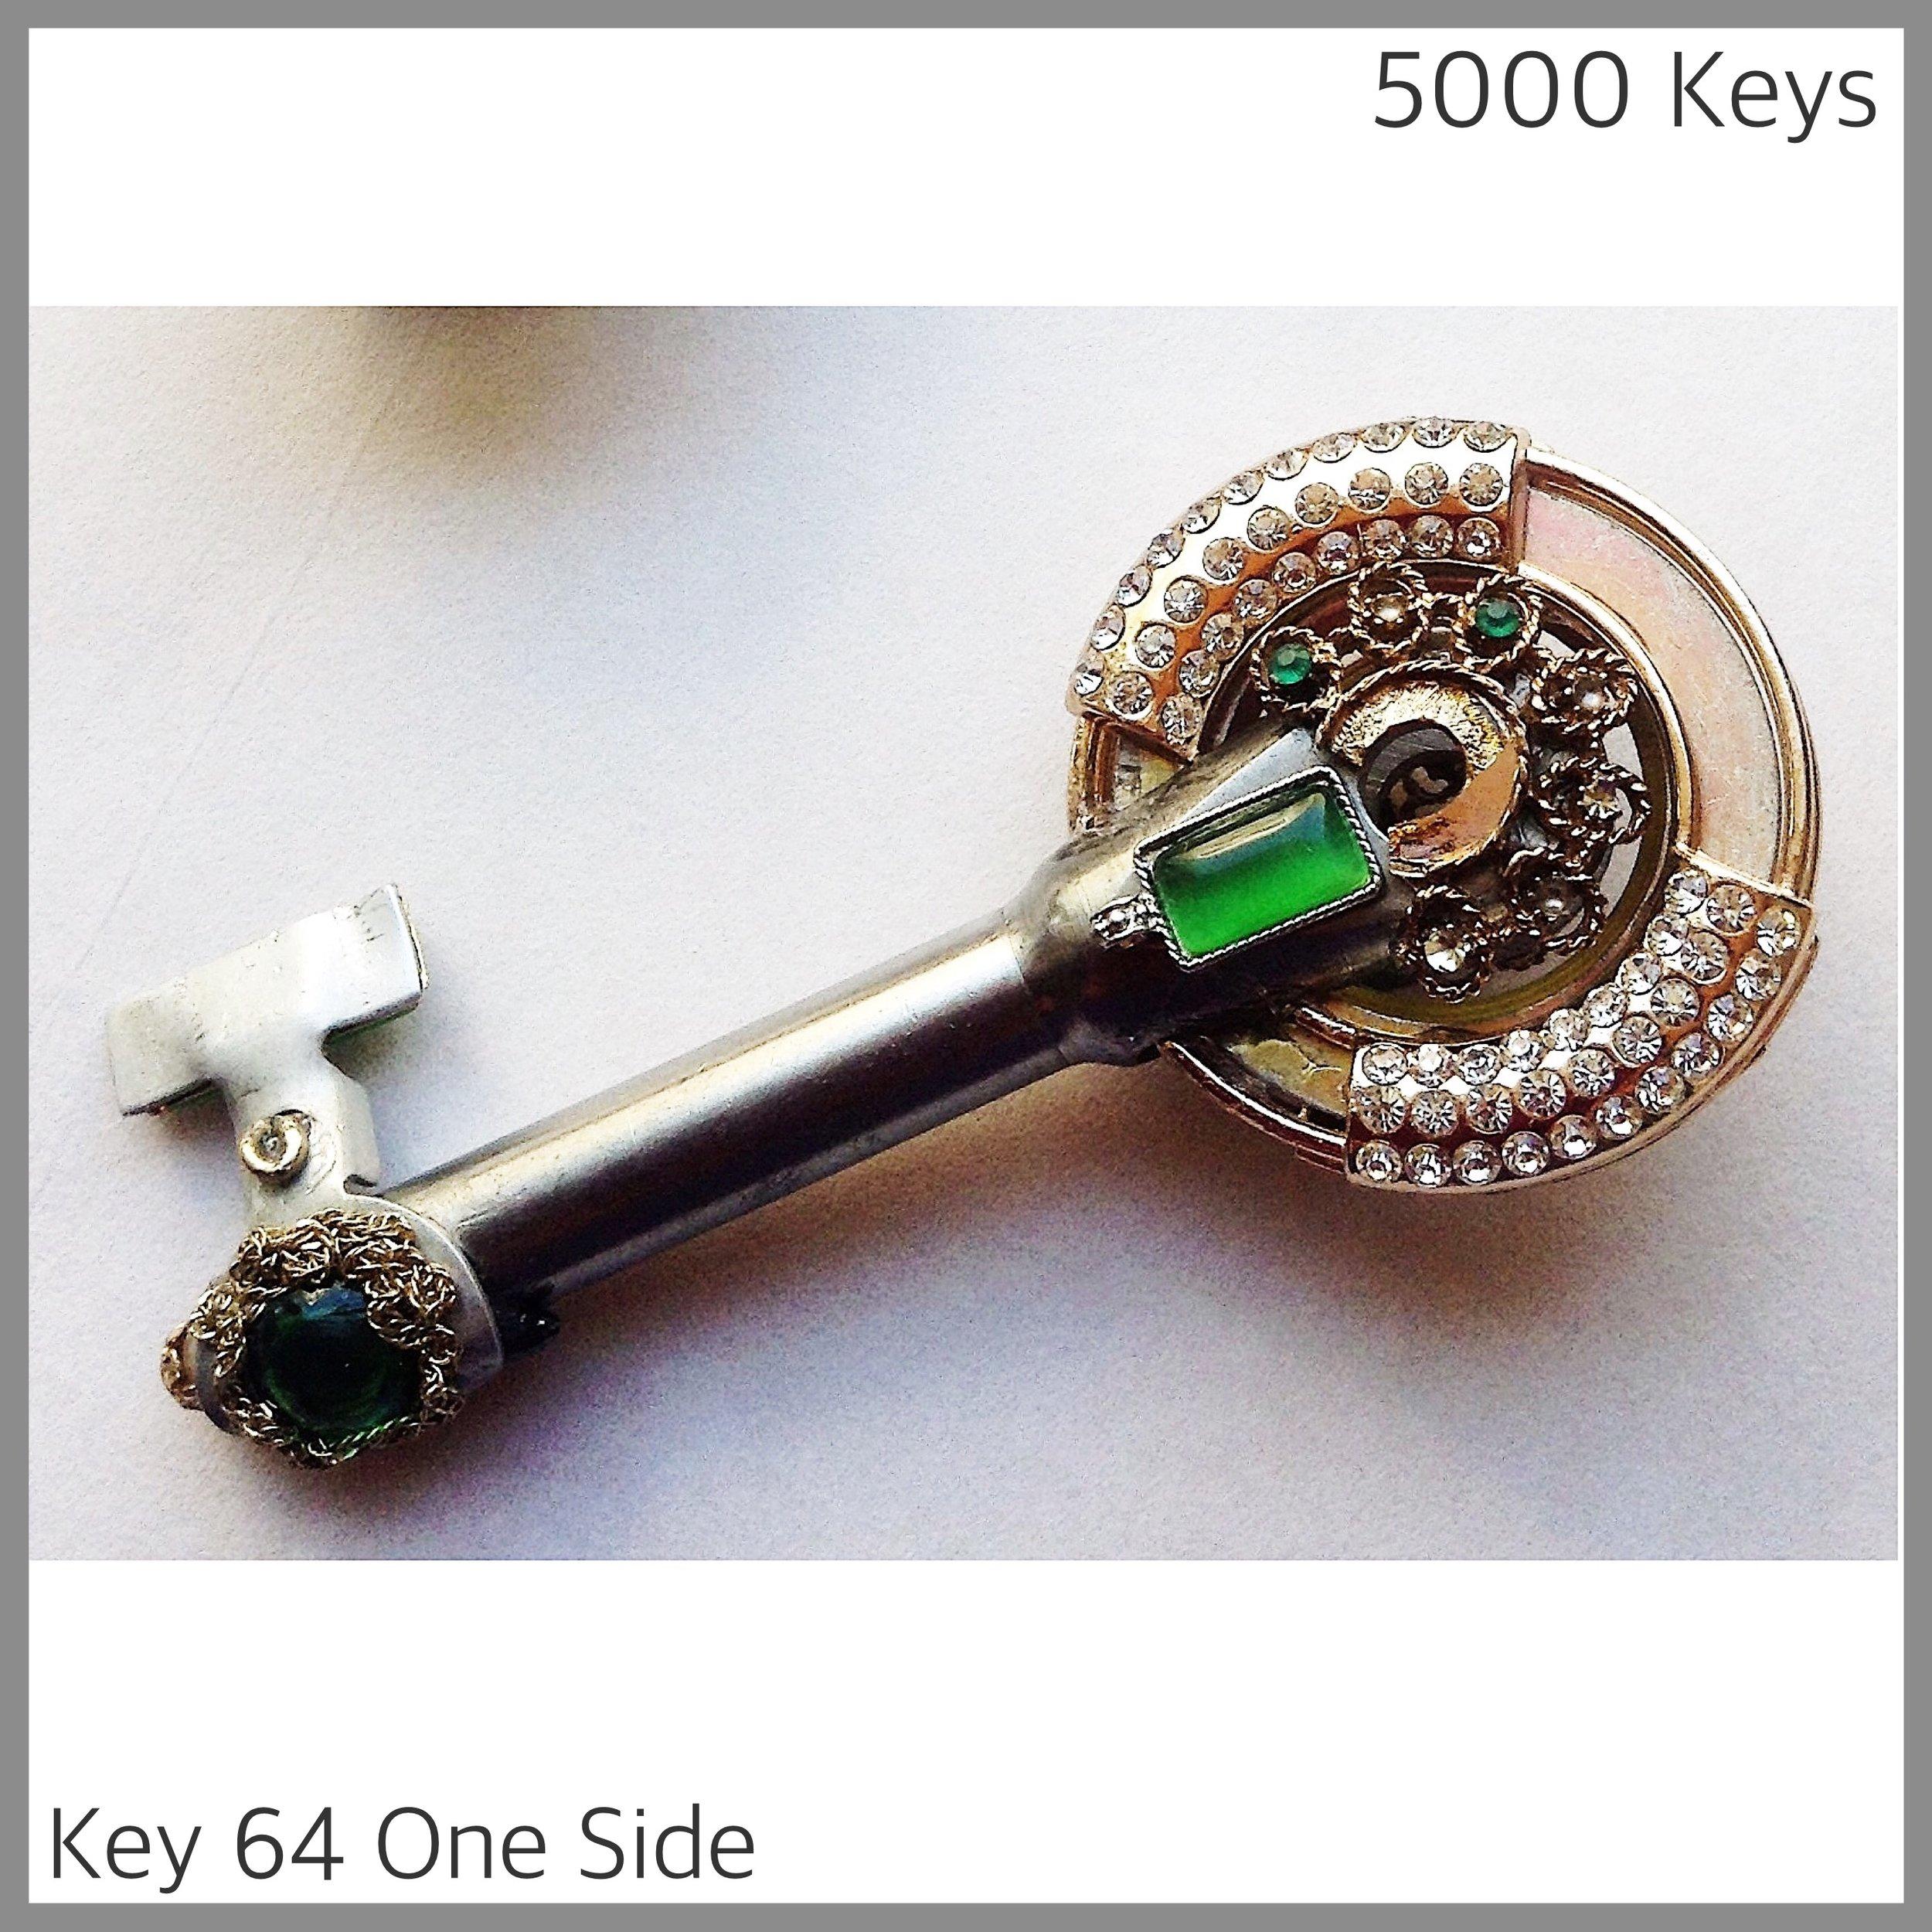 Key 64 one side - 1.JPG